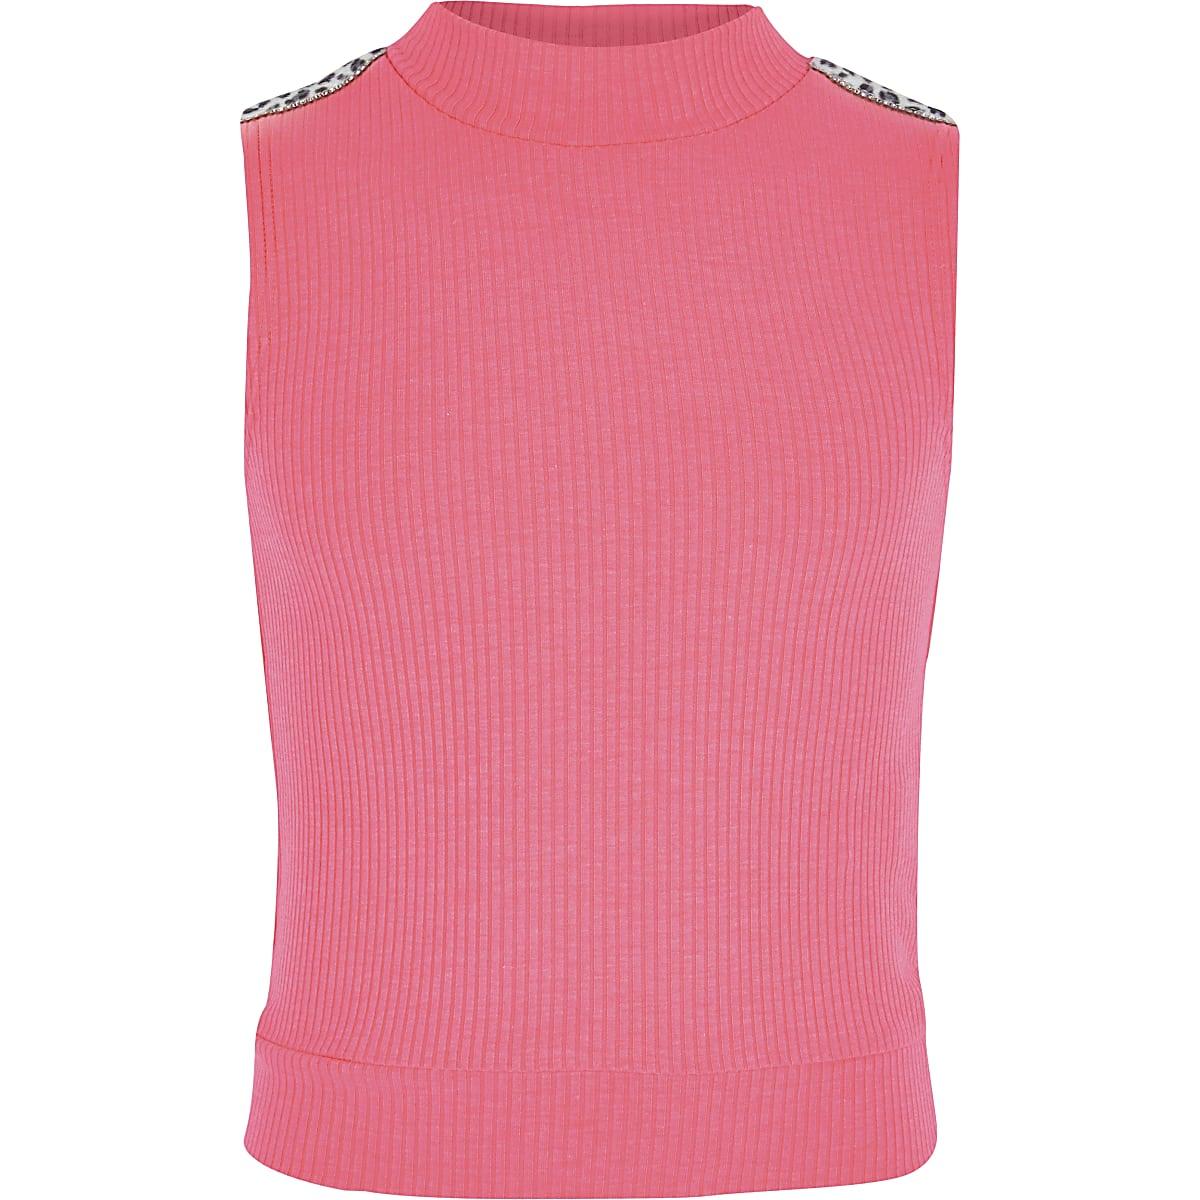 Girls neon pink rhinestone trim high neck top